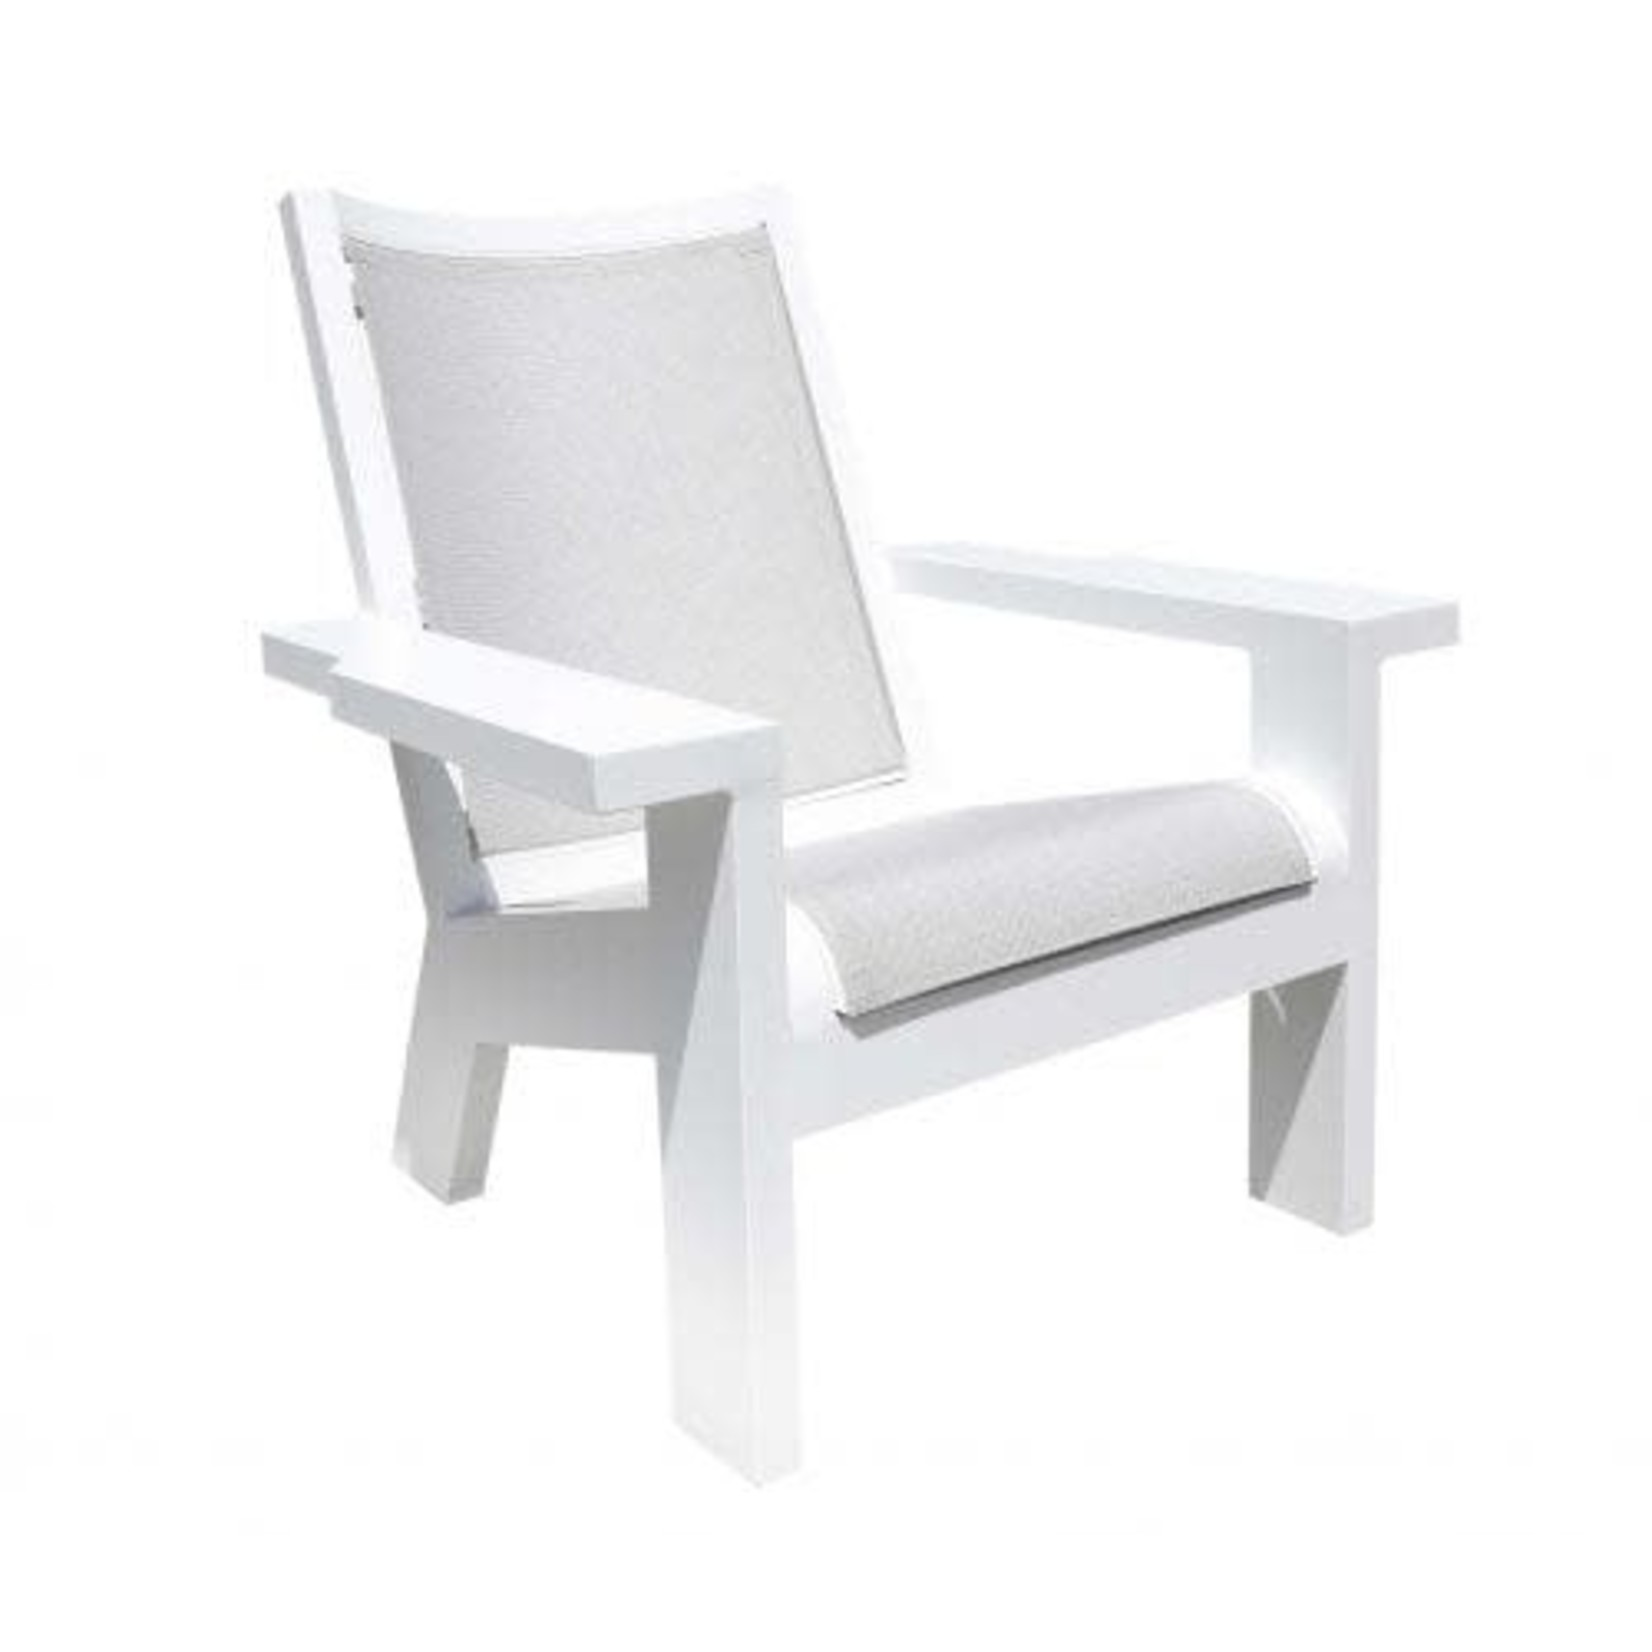 Cabana Coast Hockley Muskoka Chair